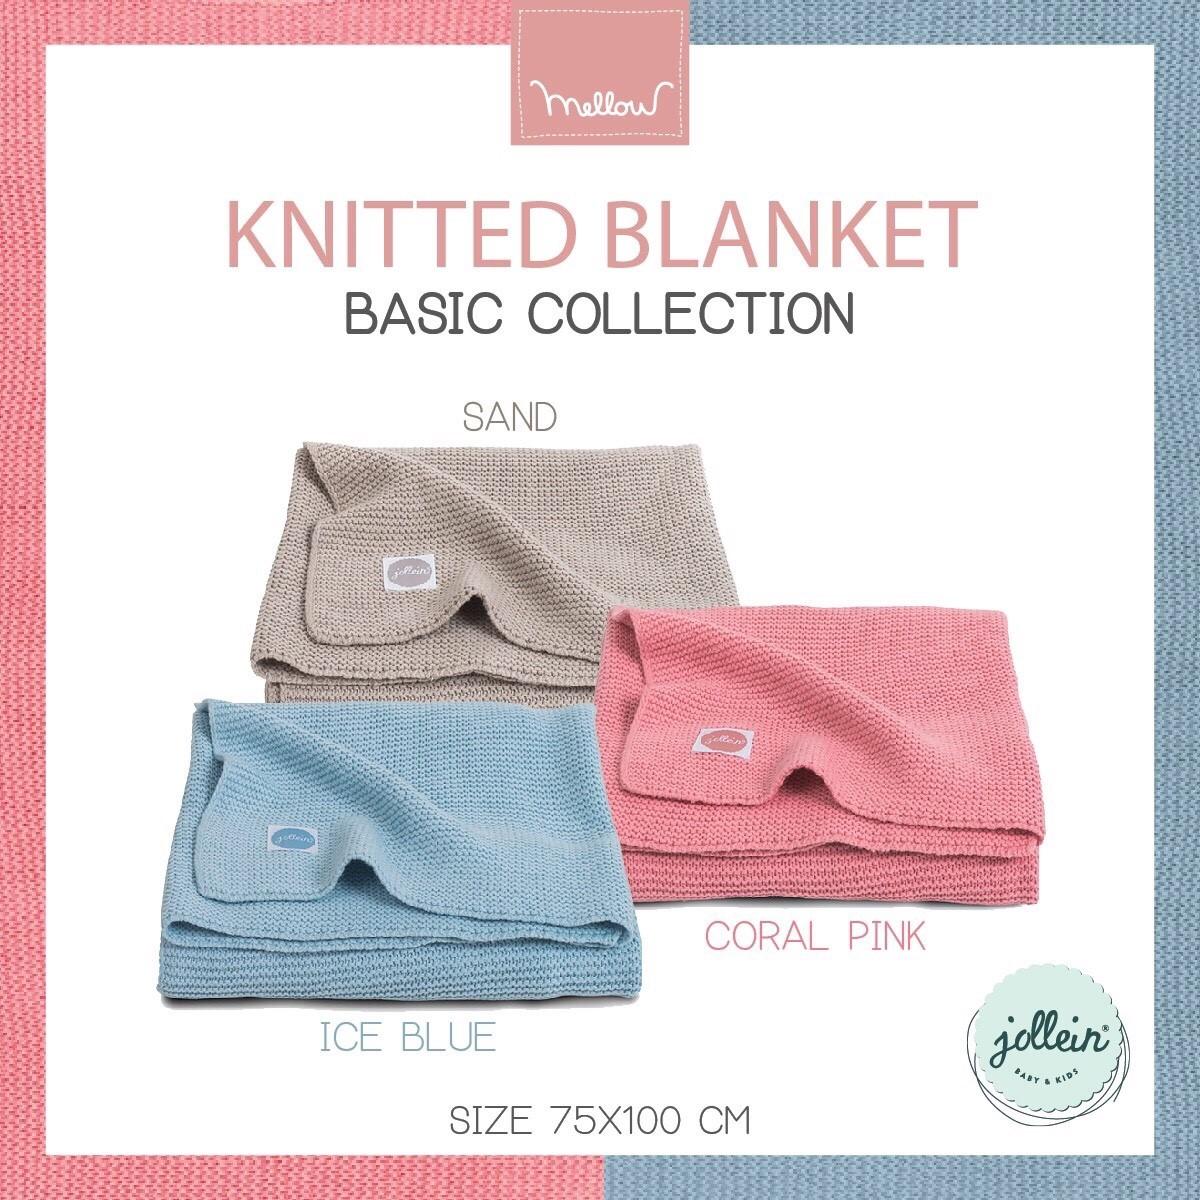 Jollein - Knitted Sand ผ้าห่มไหมพรมสุดนิ่ม สีน้ำตาล